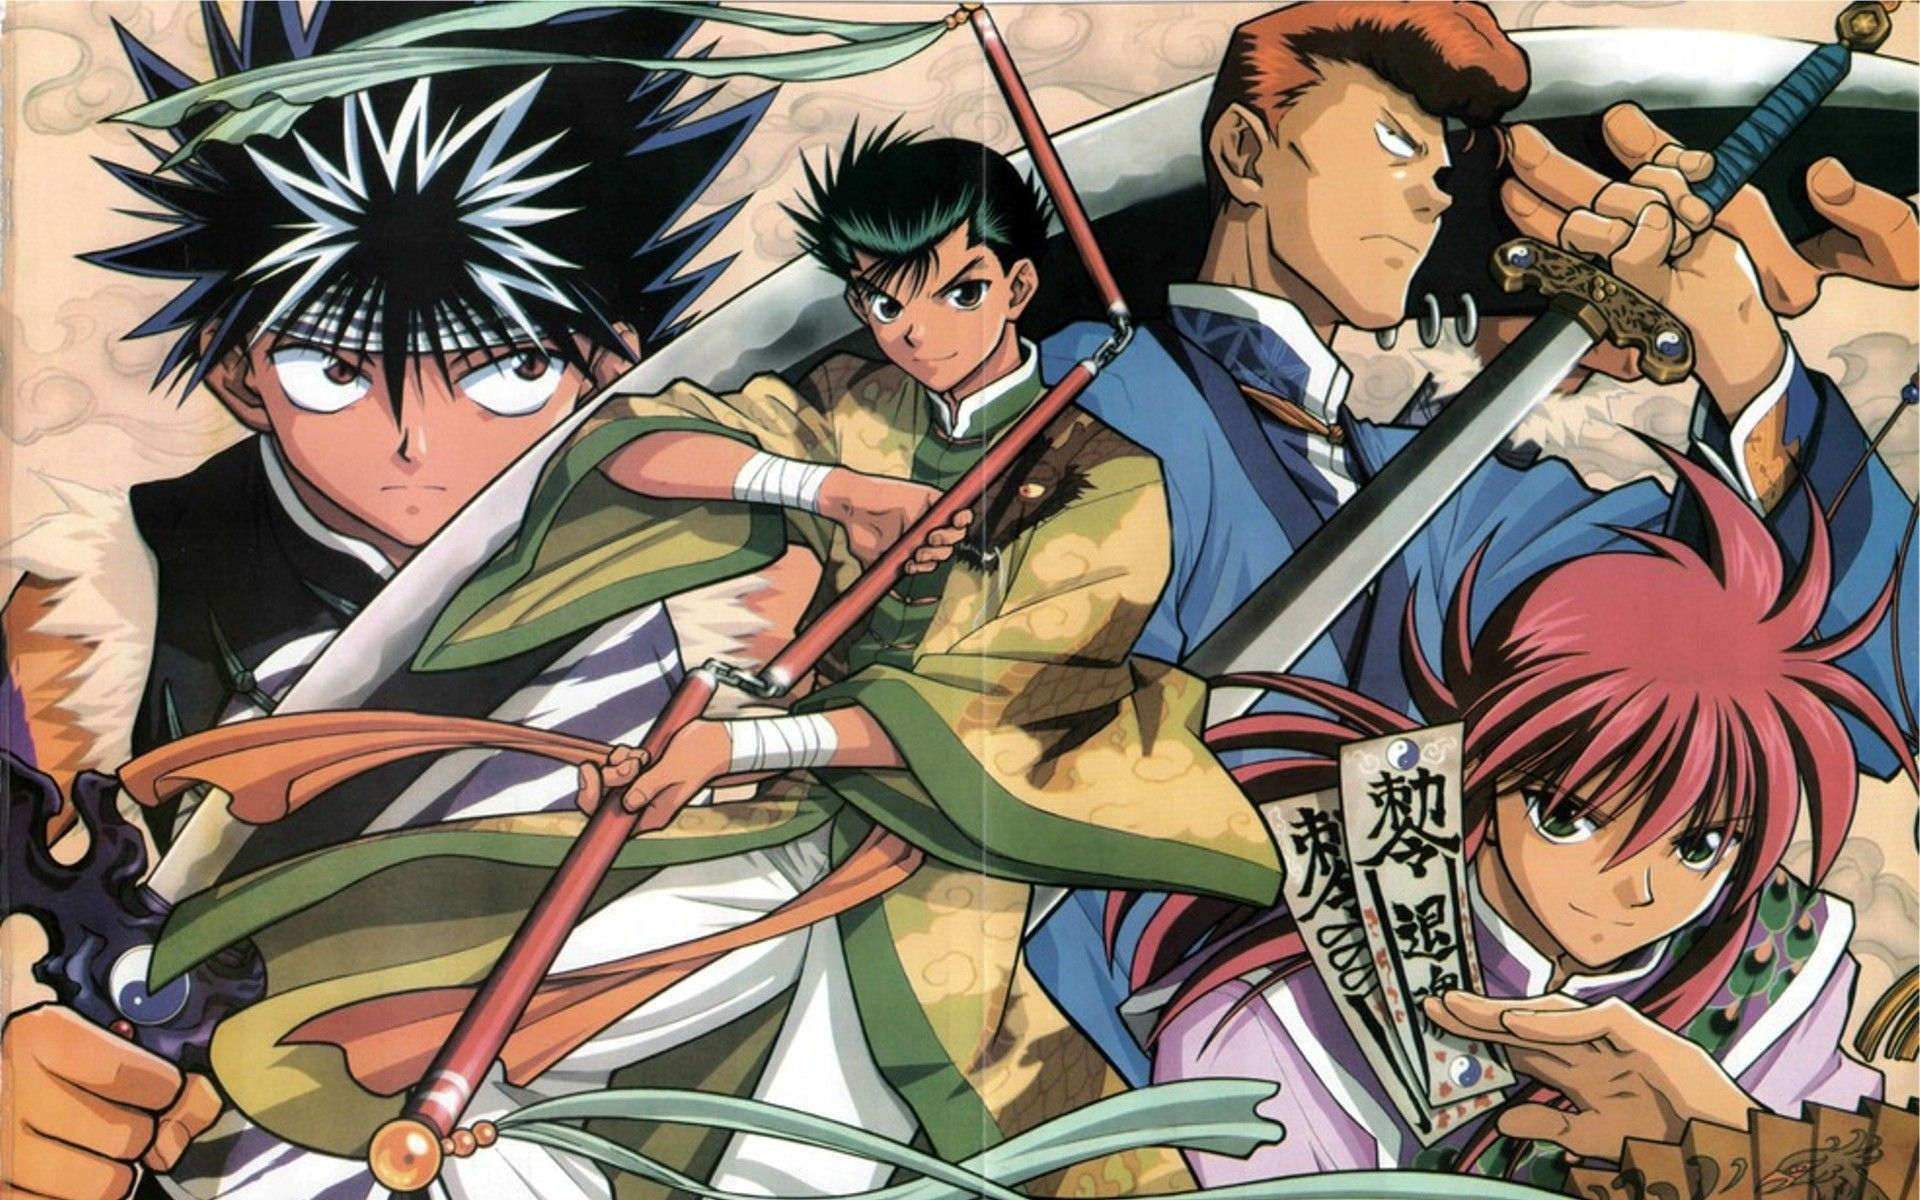 yu yu hakusho wallpapers high quality | download free | manga